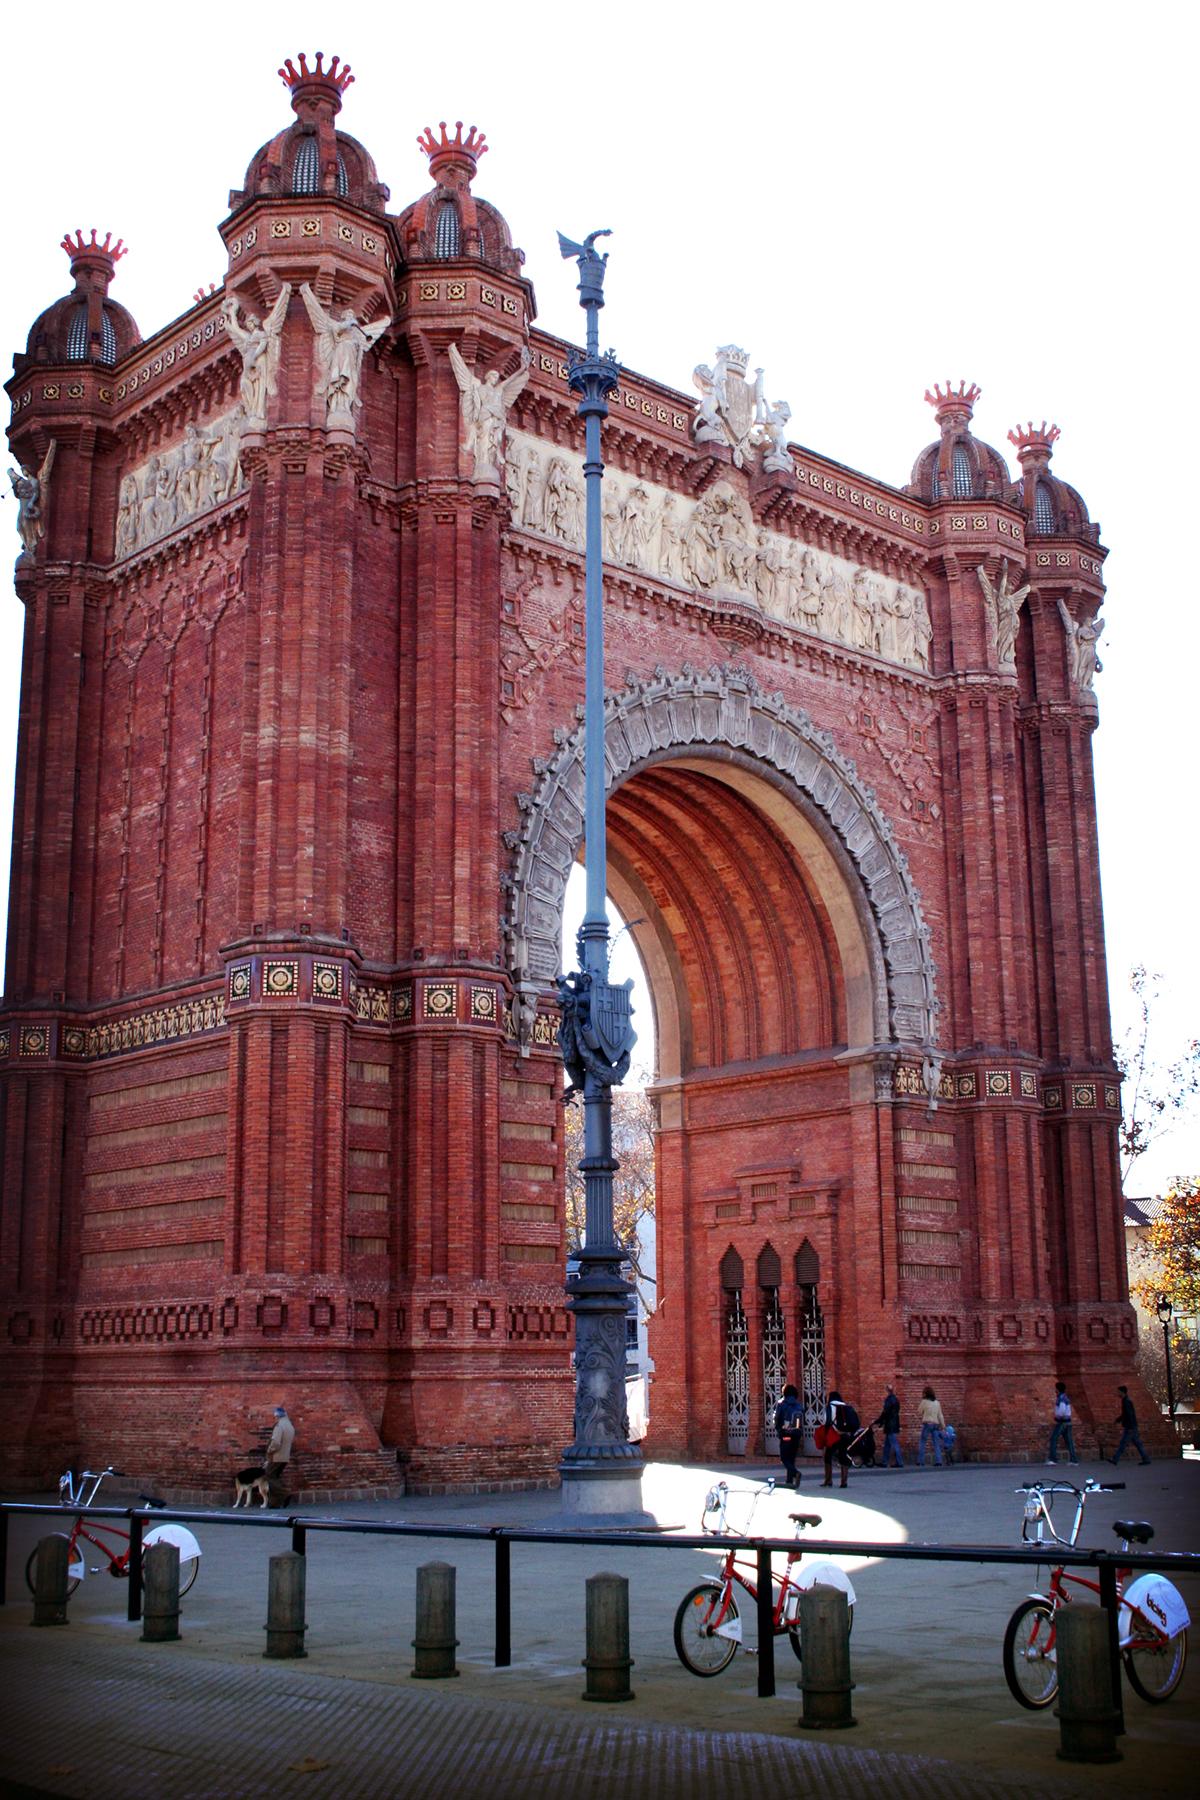 Barcelona, Spain (2009)